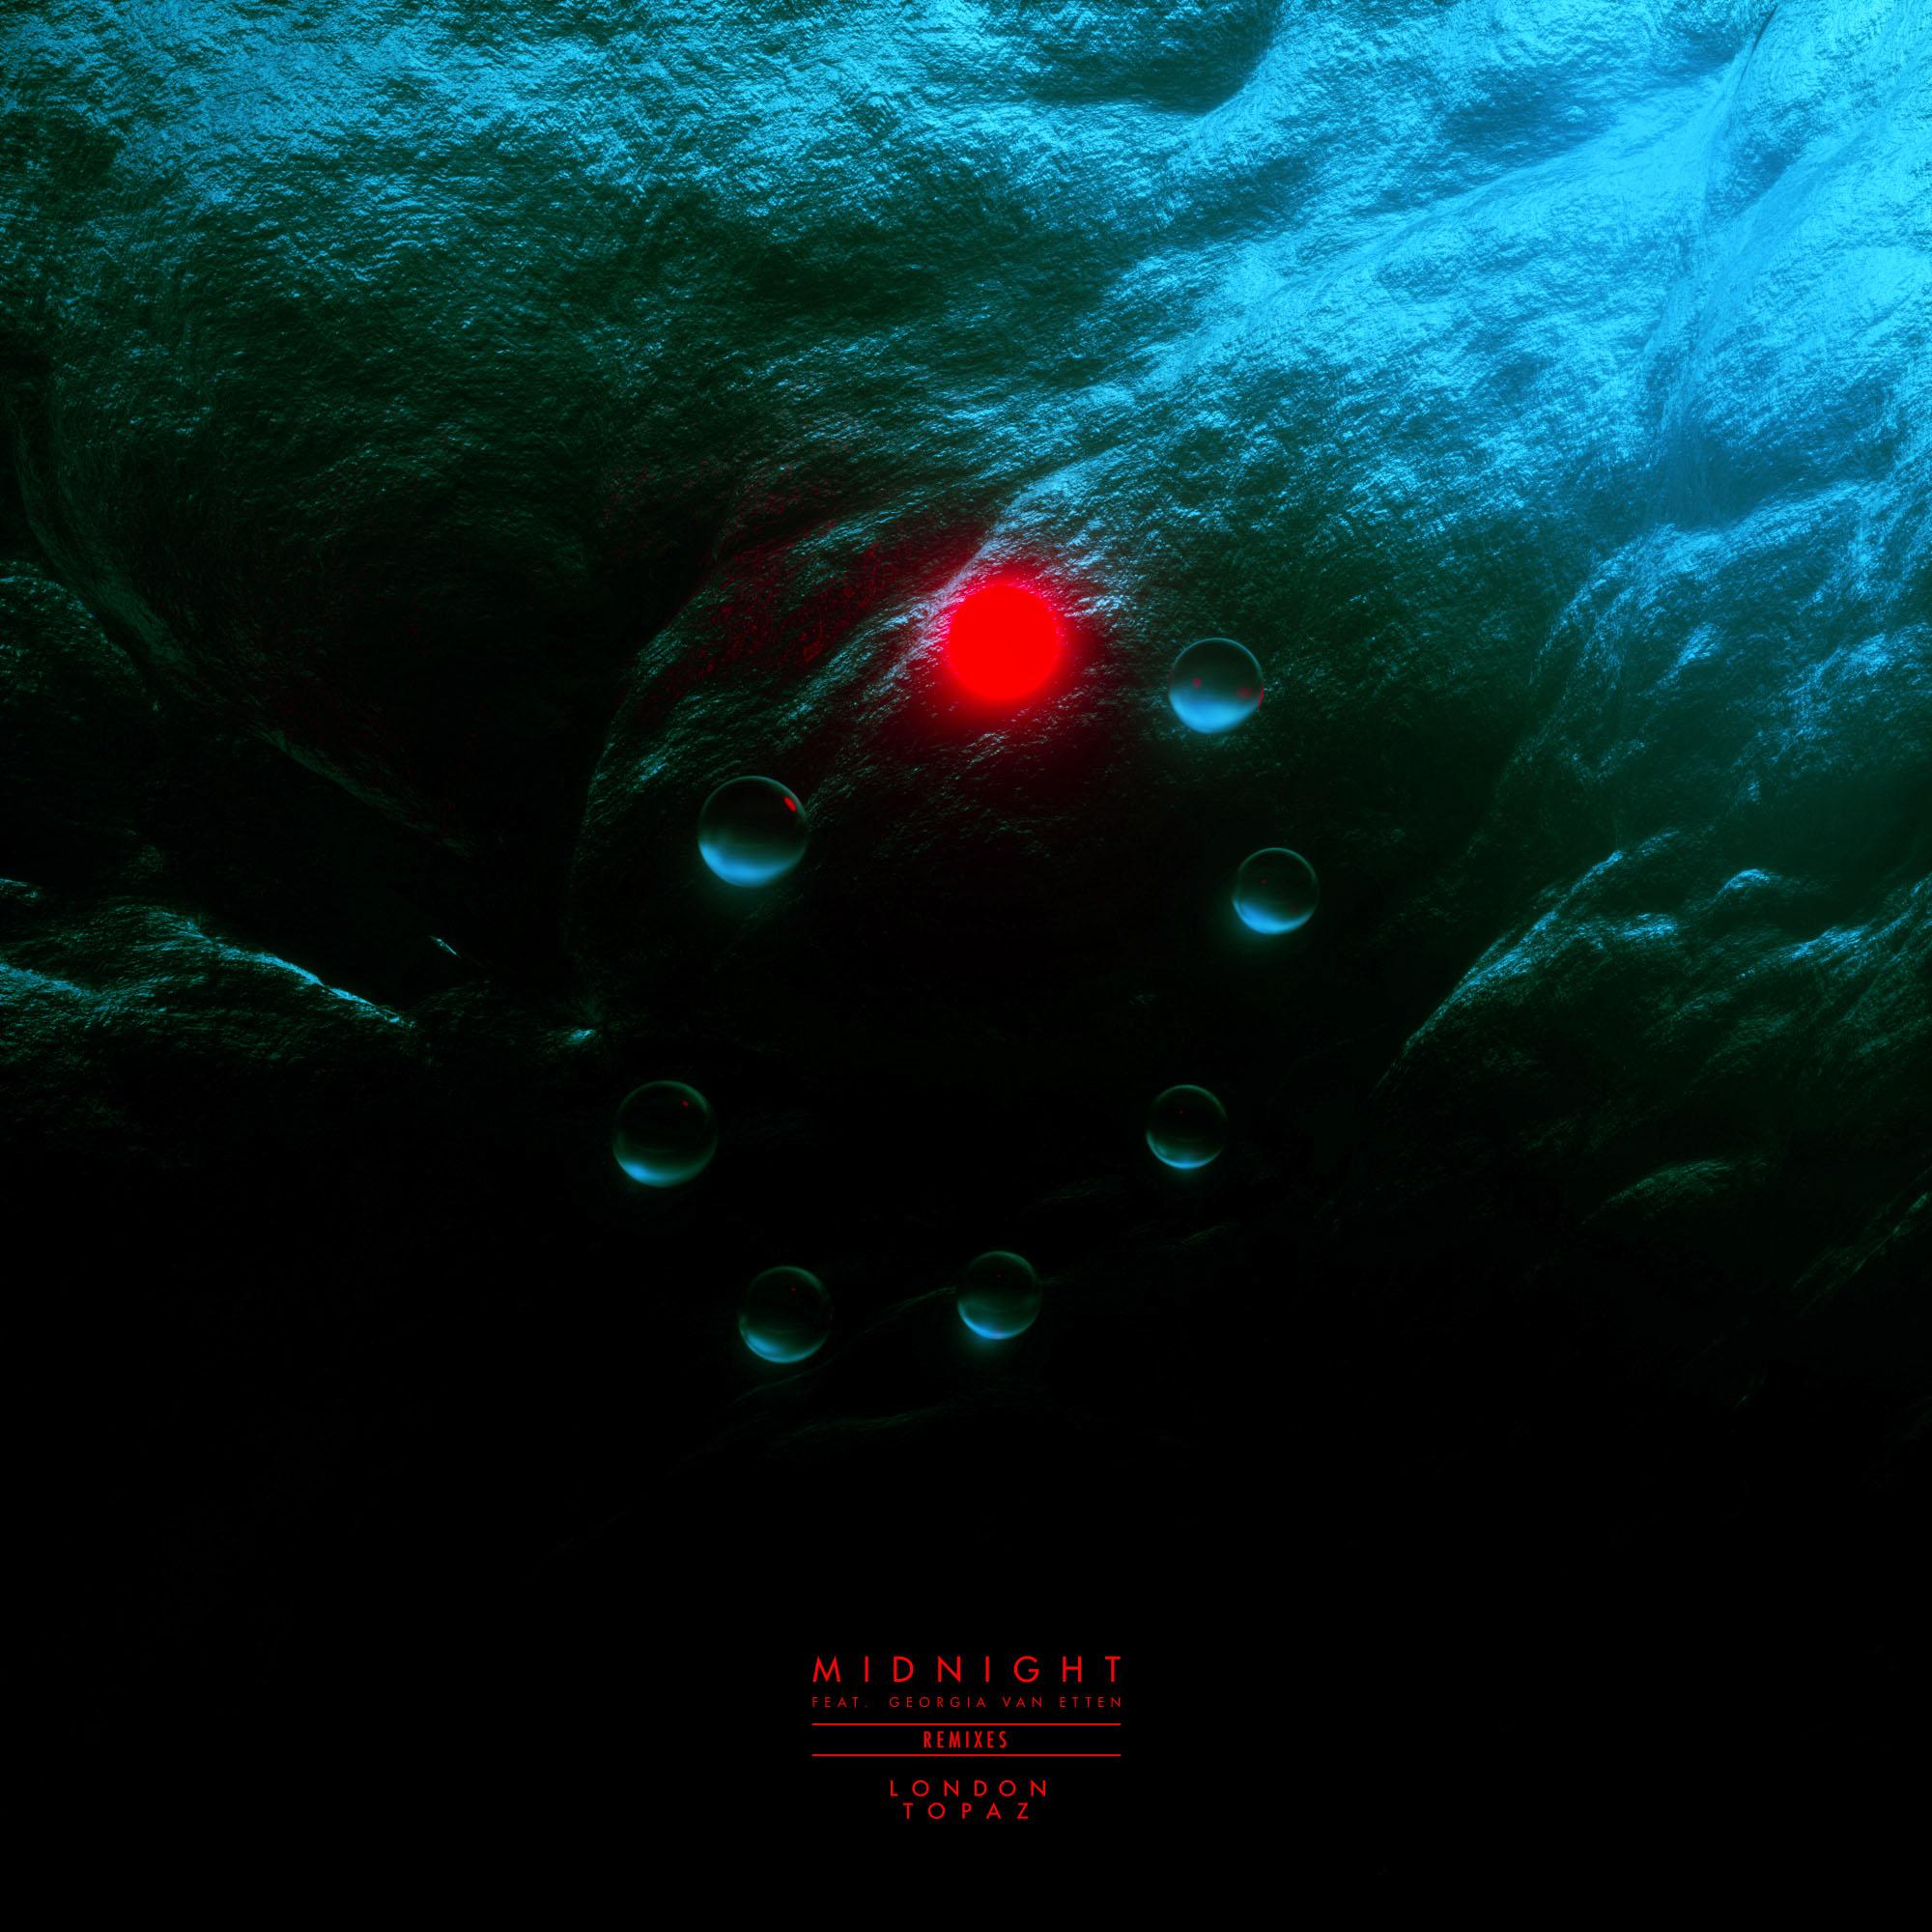 London Topaz - Midnight ft. Georgia van Etten [Remixes]